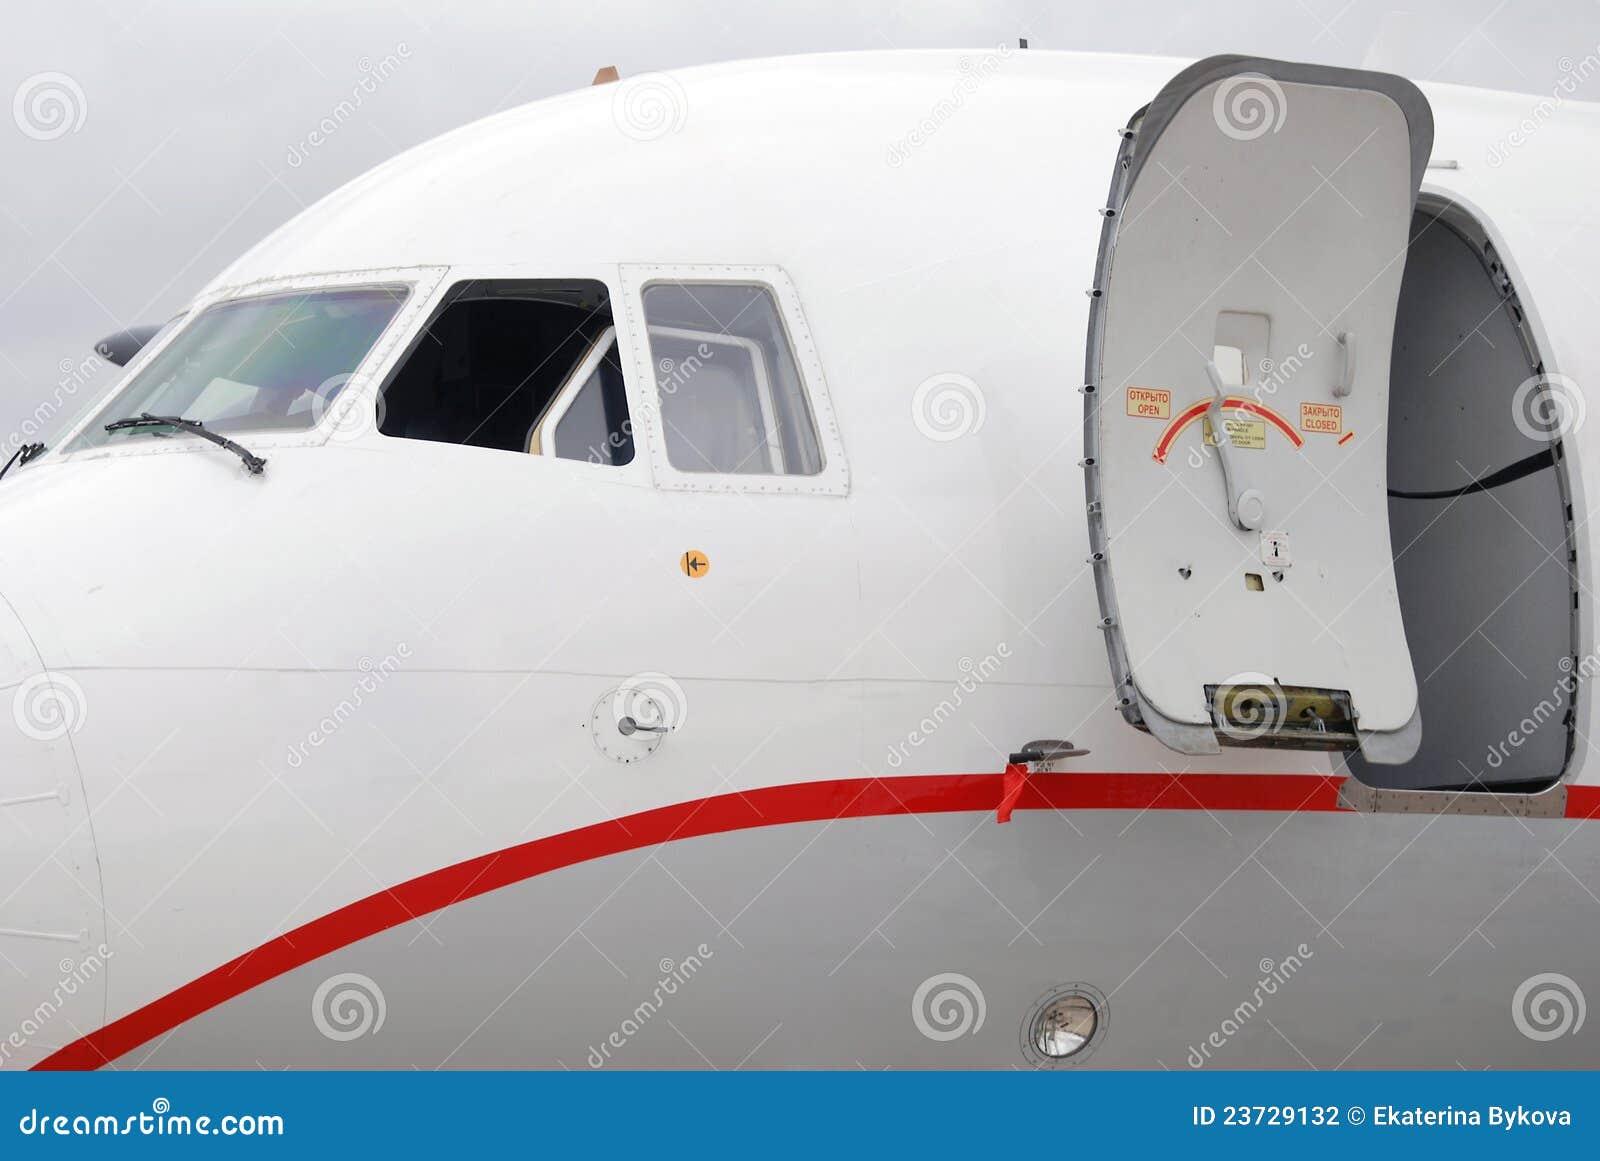 Tu Russian airplane tale door and window & Tu Russian Airplane Tale Door And Window Stock Photography ... Pezcame.Com